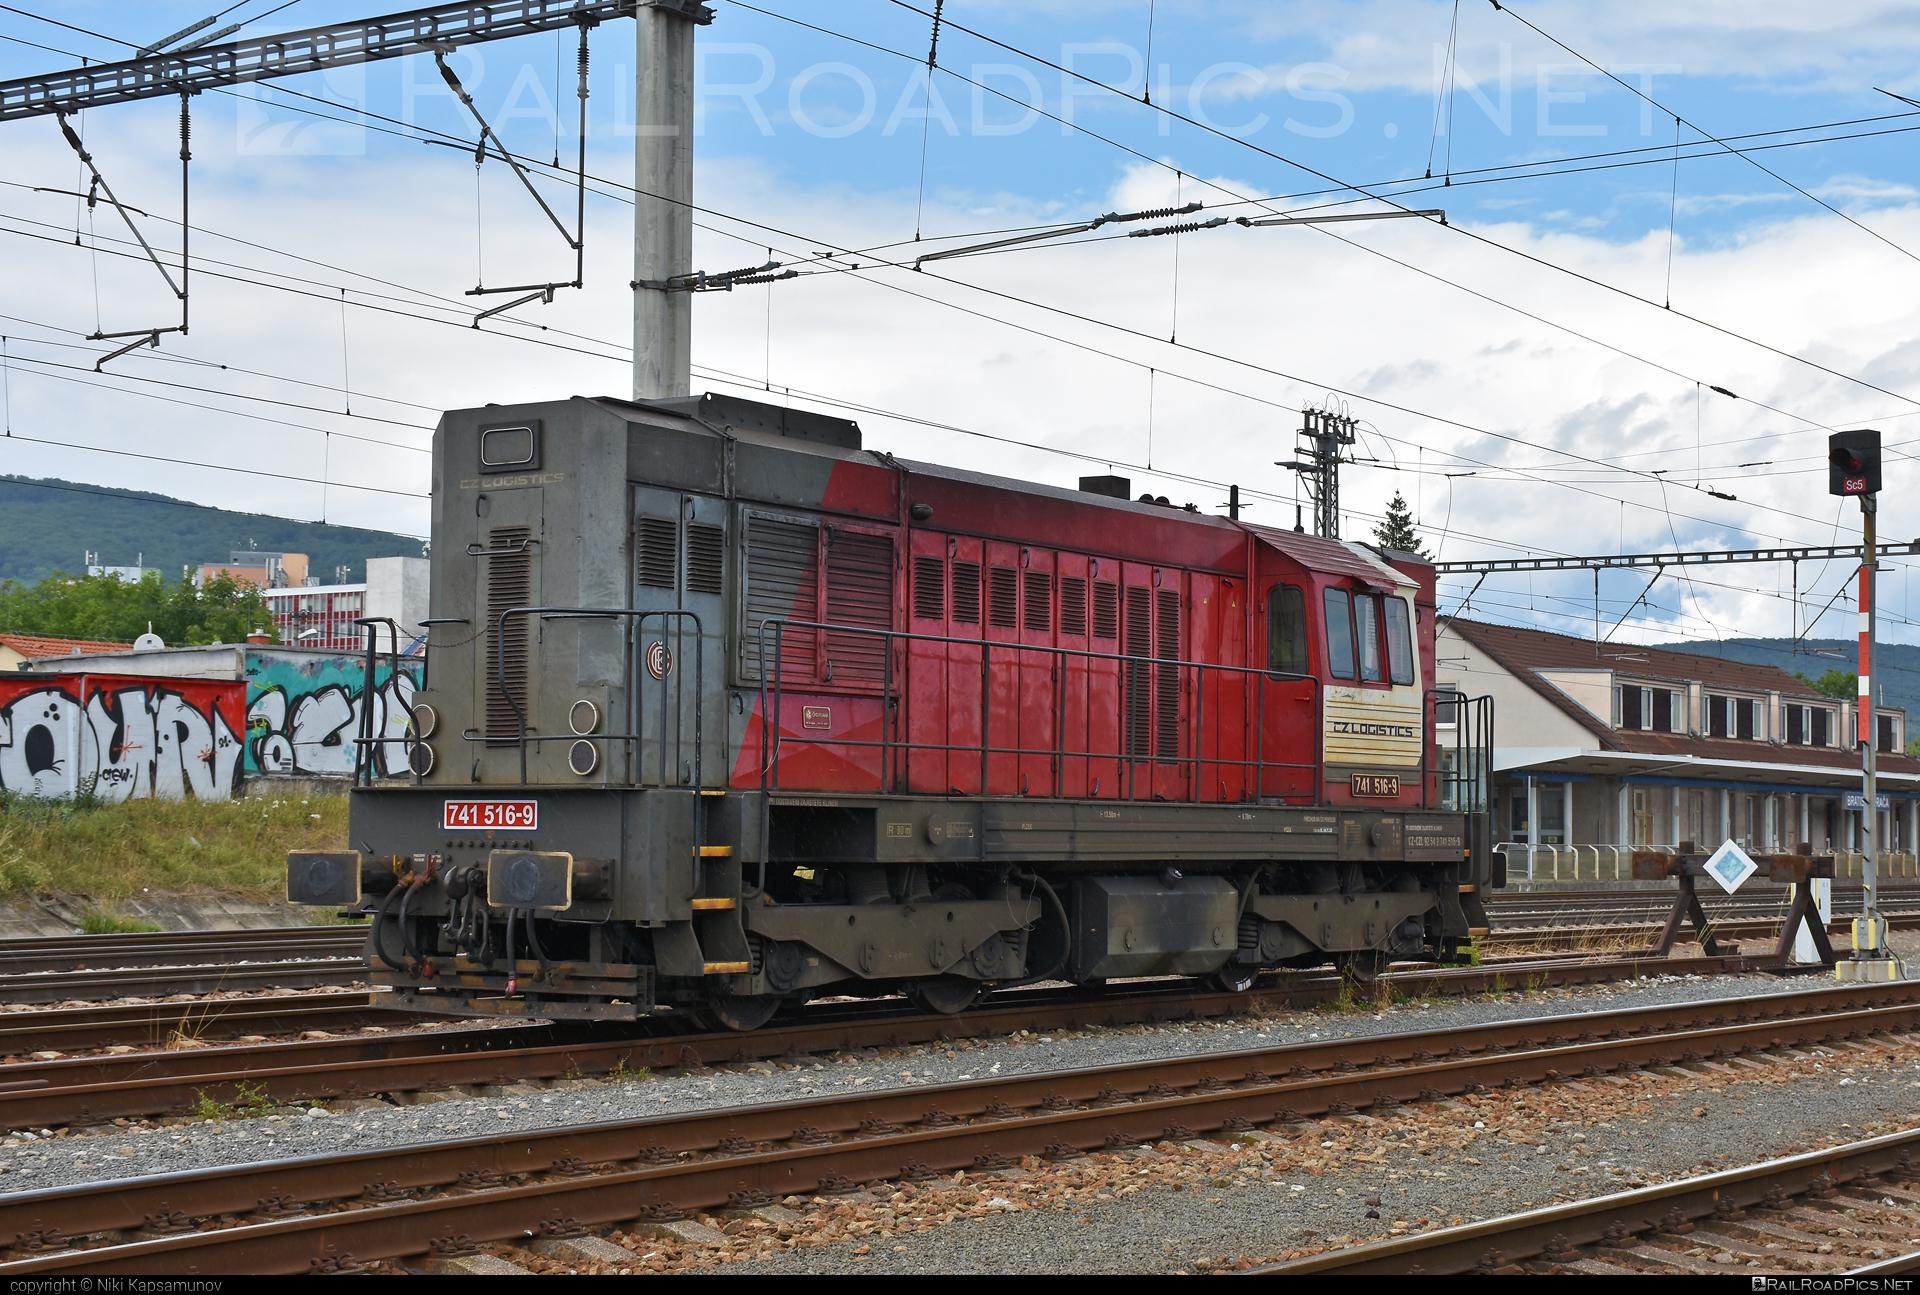 CZ LOKO Class 741.5 - 741 516-9 operated by CZ Logistics, s.r.o. #czlogistics #czloko #czloko7415 #czlokoas #kocur #locomotive7415